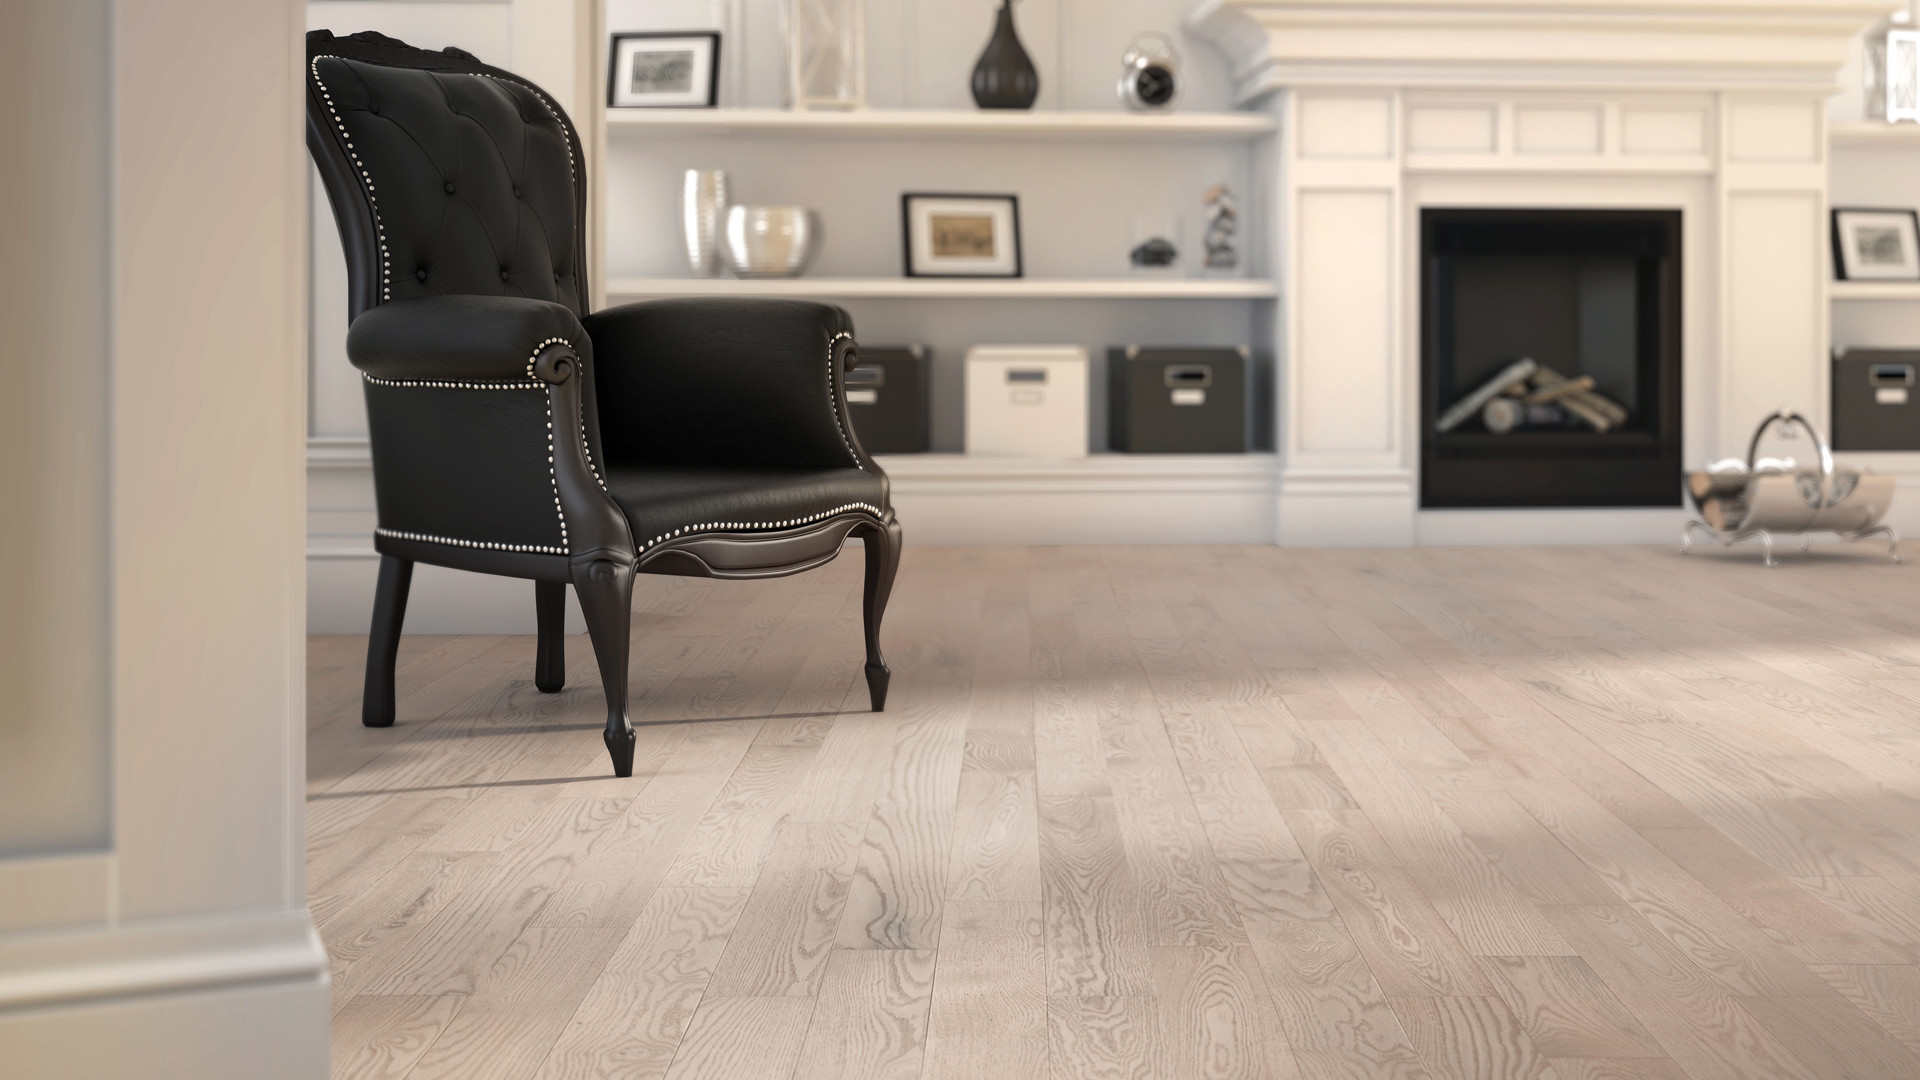 hardwood floor ideas styles of does hardwood floor hardness matter lauzon flooring regarding 4 plank construction